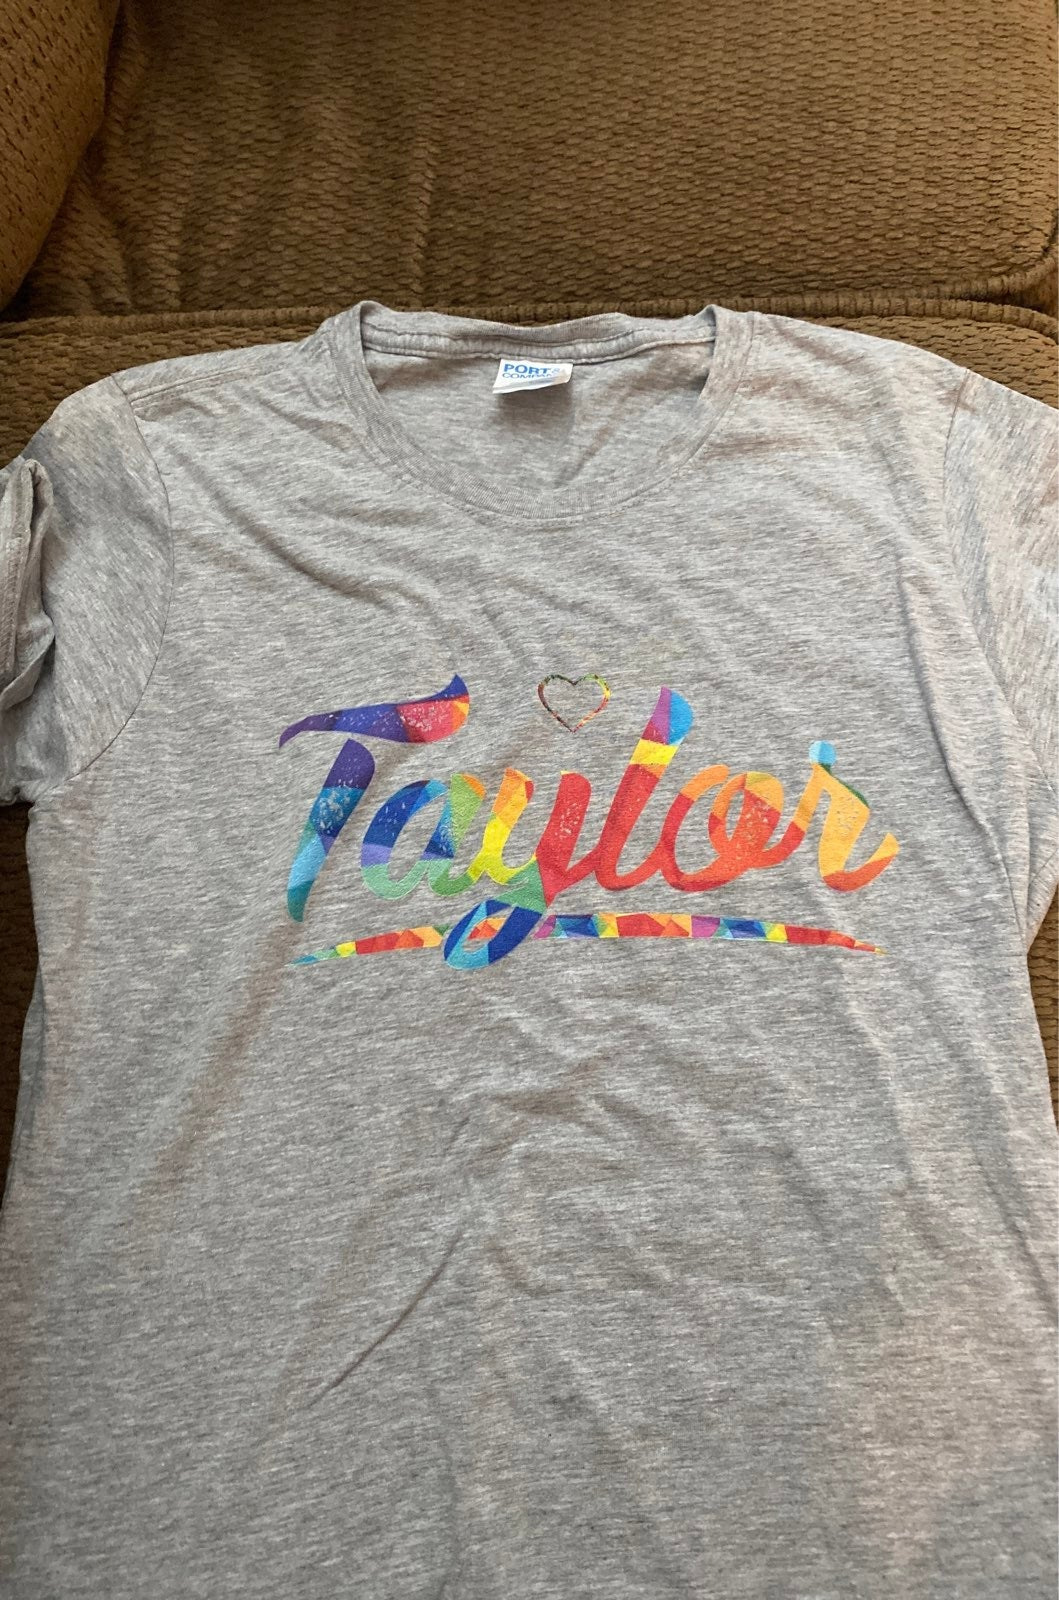 Taylor Swift rainbow shirt